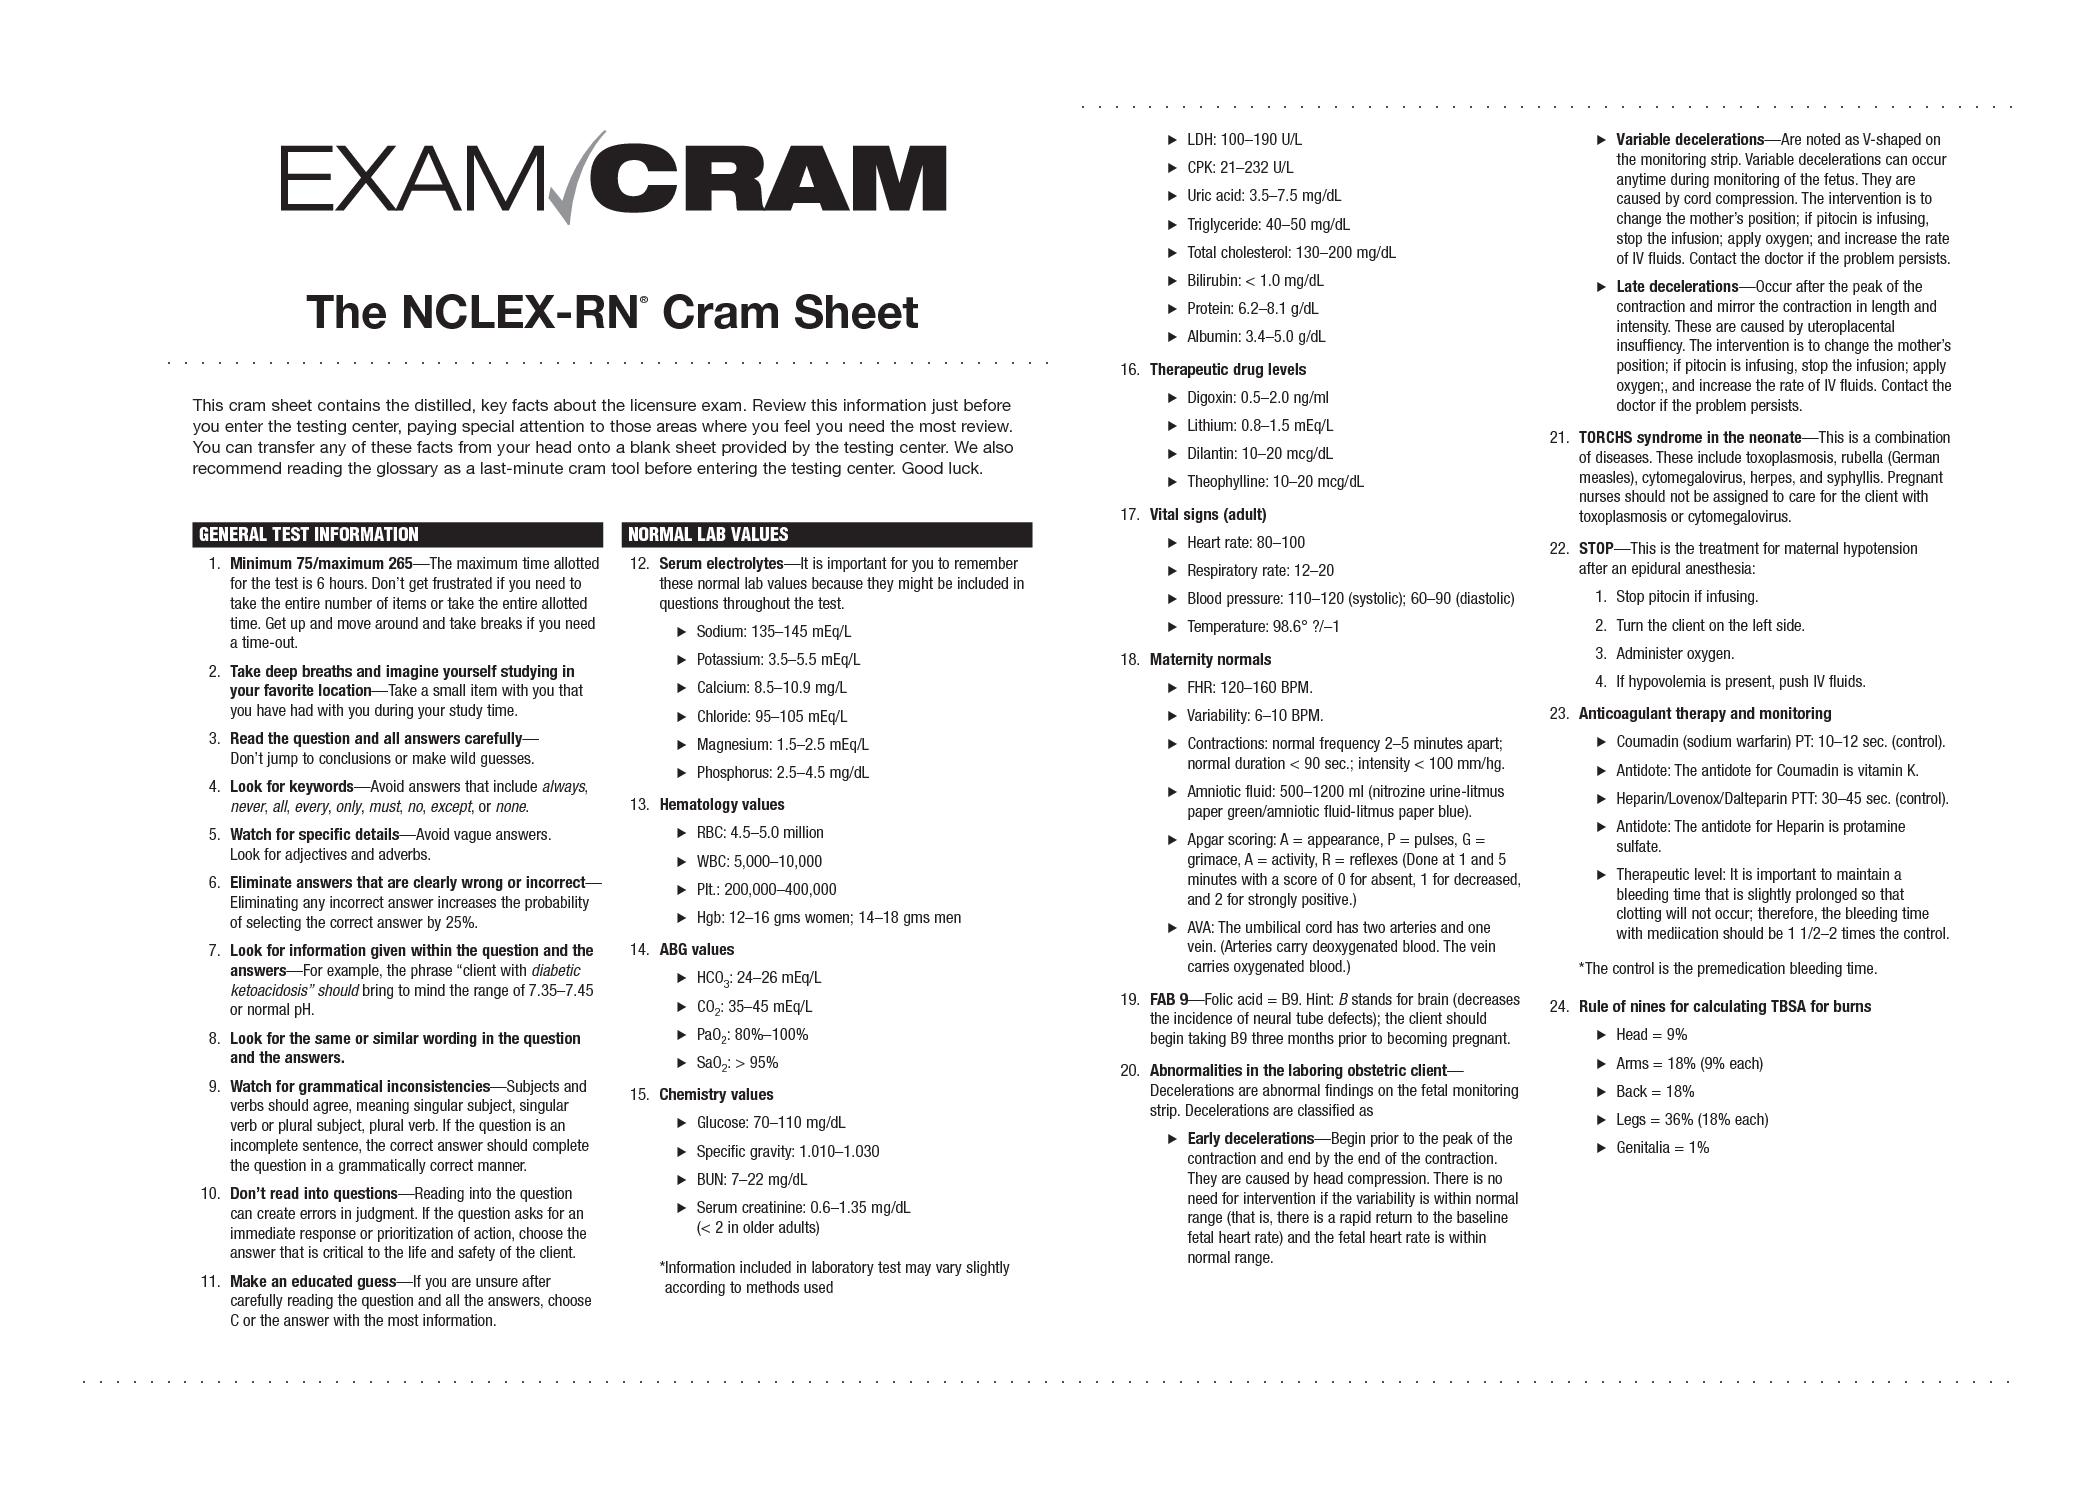 Blank Lab Value Sheet